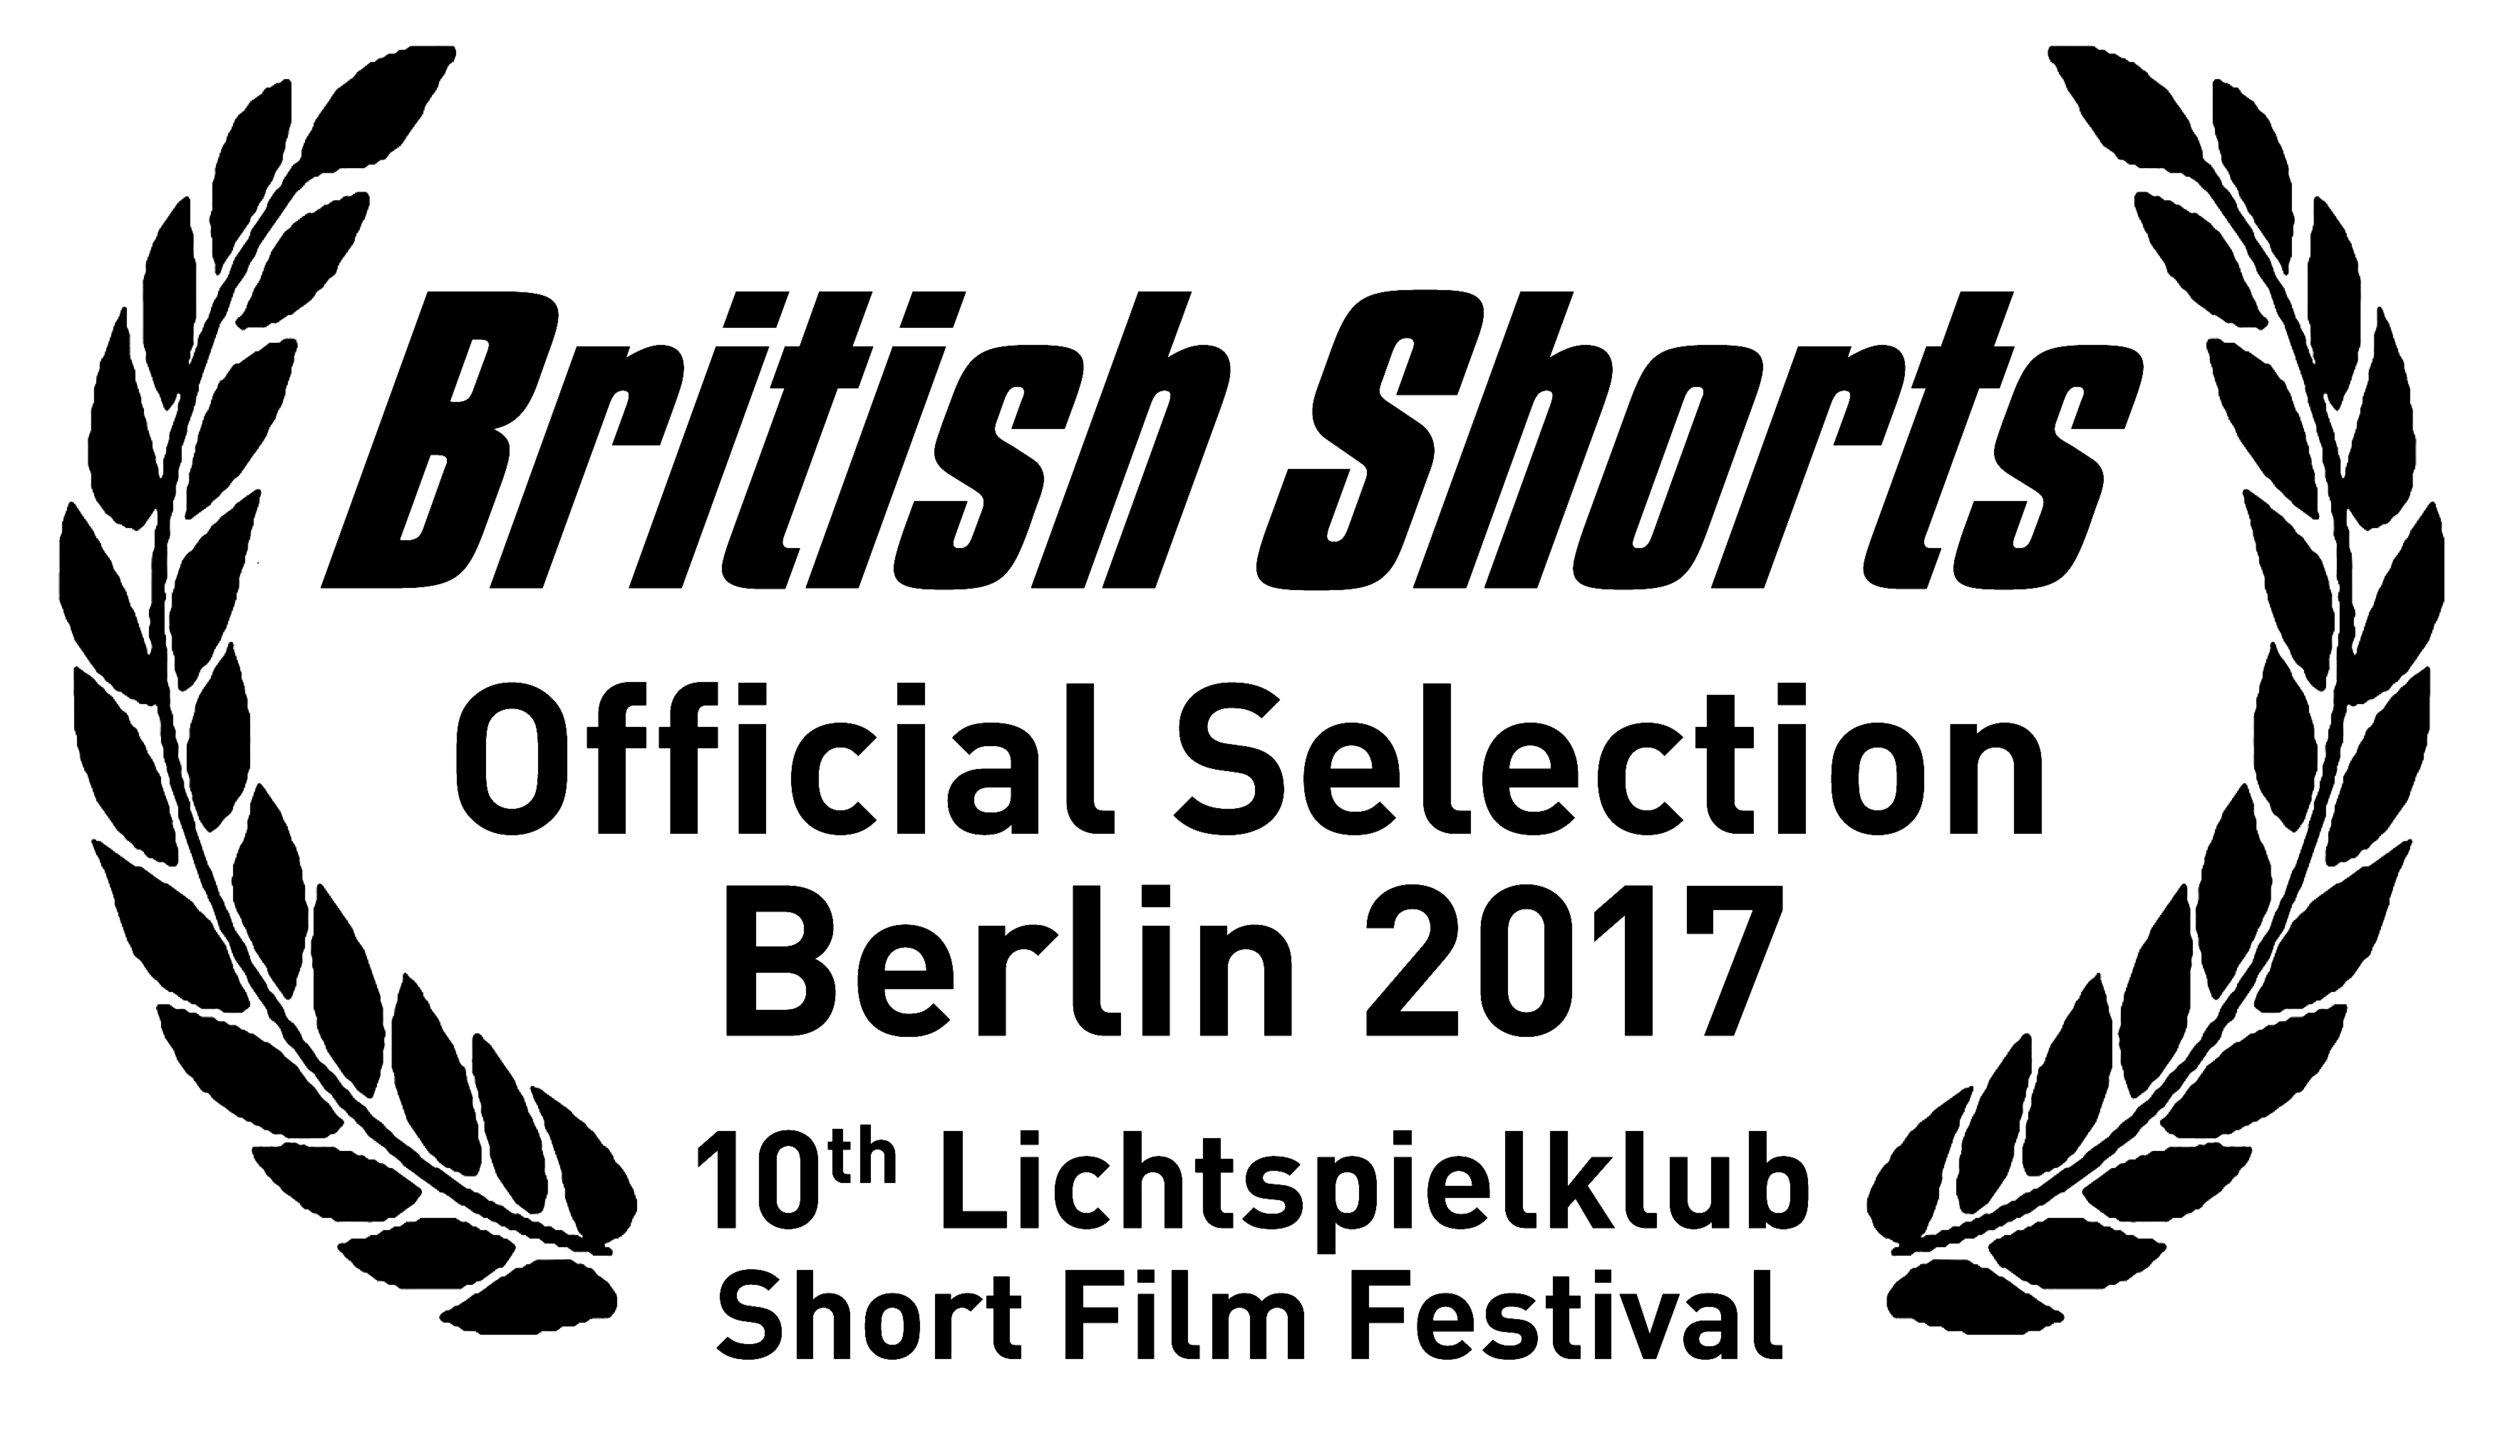 Festivals & Awards — Nick Saunders Film & Video Editor